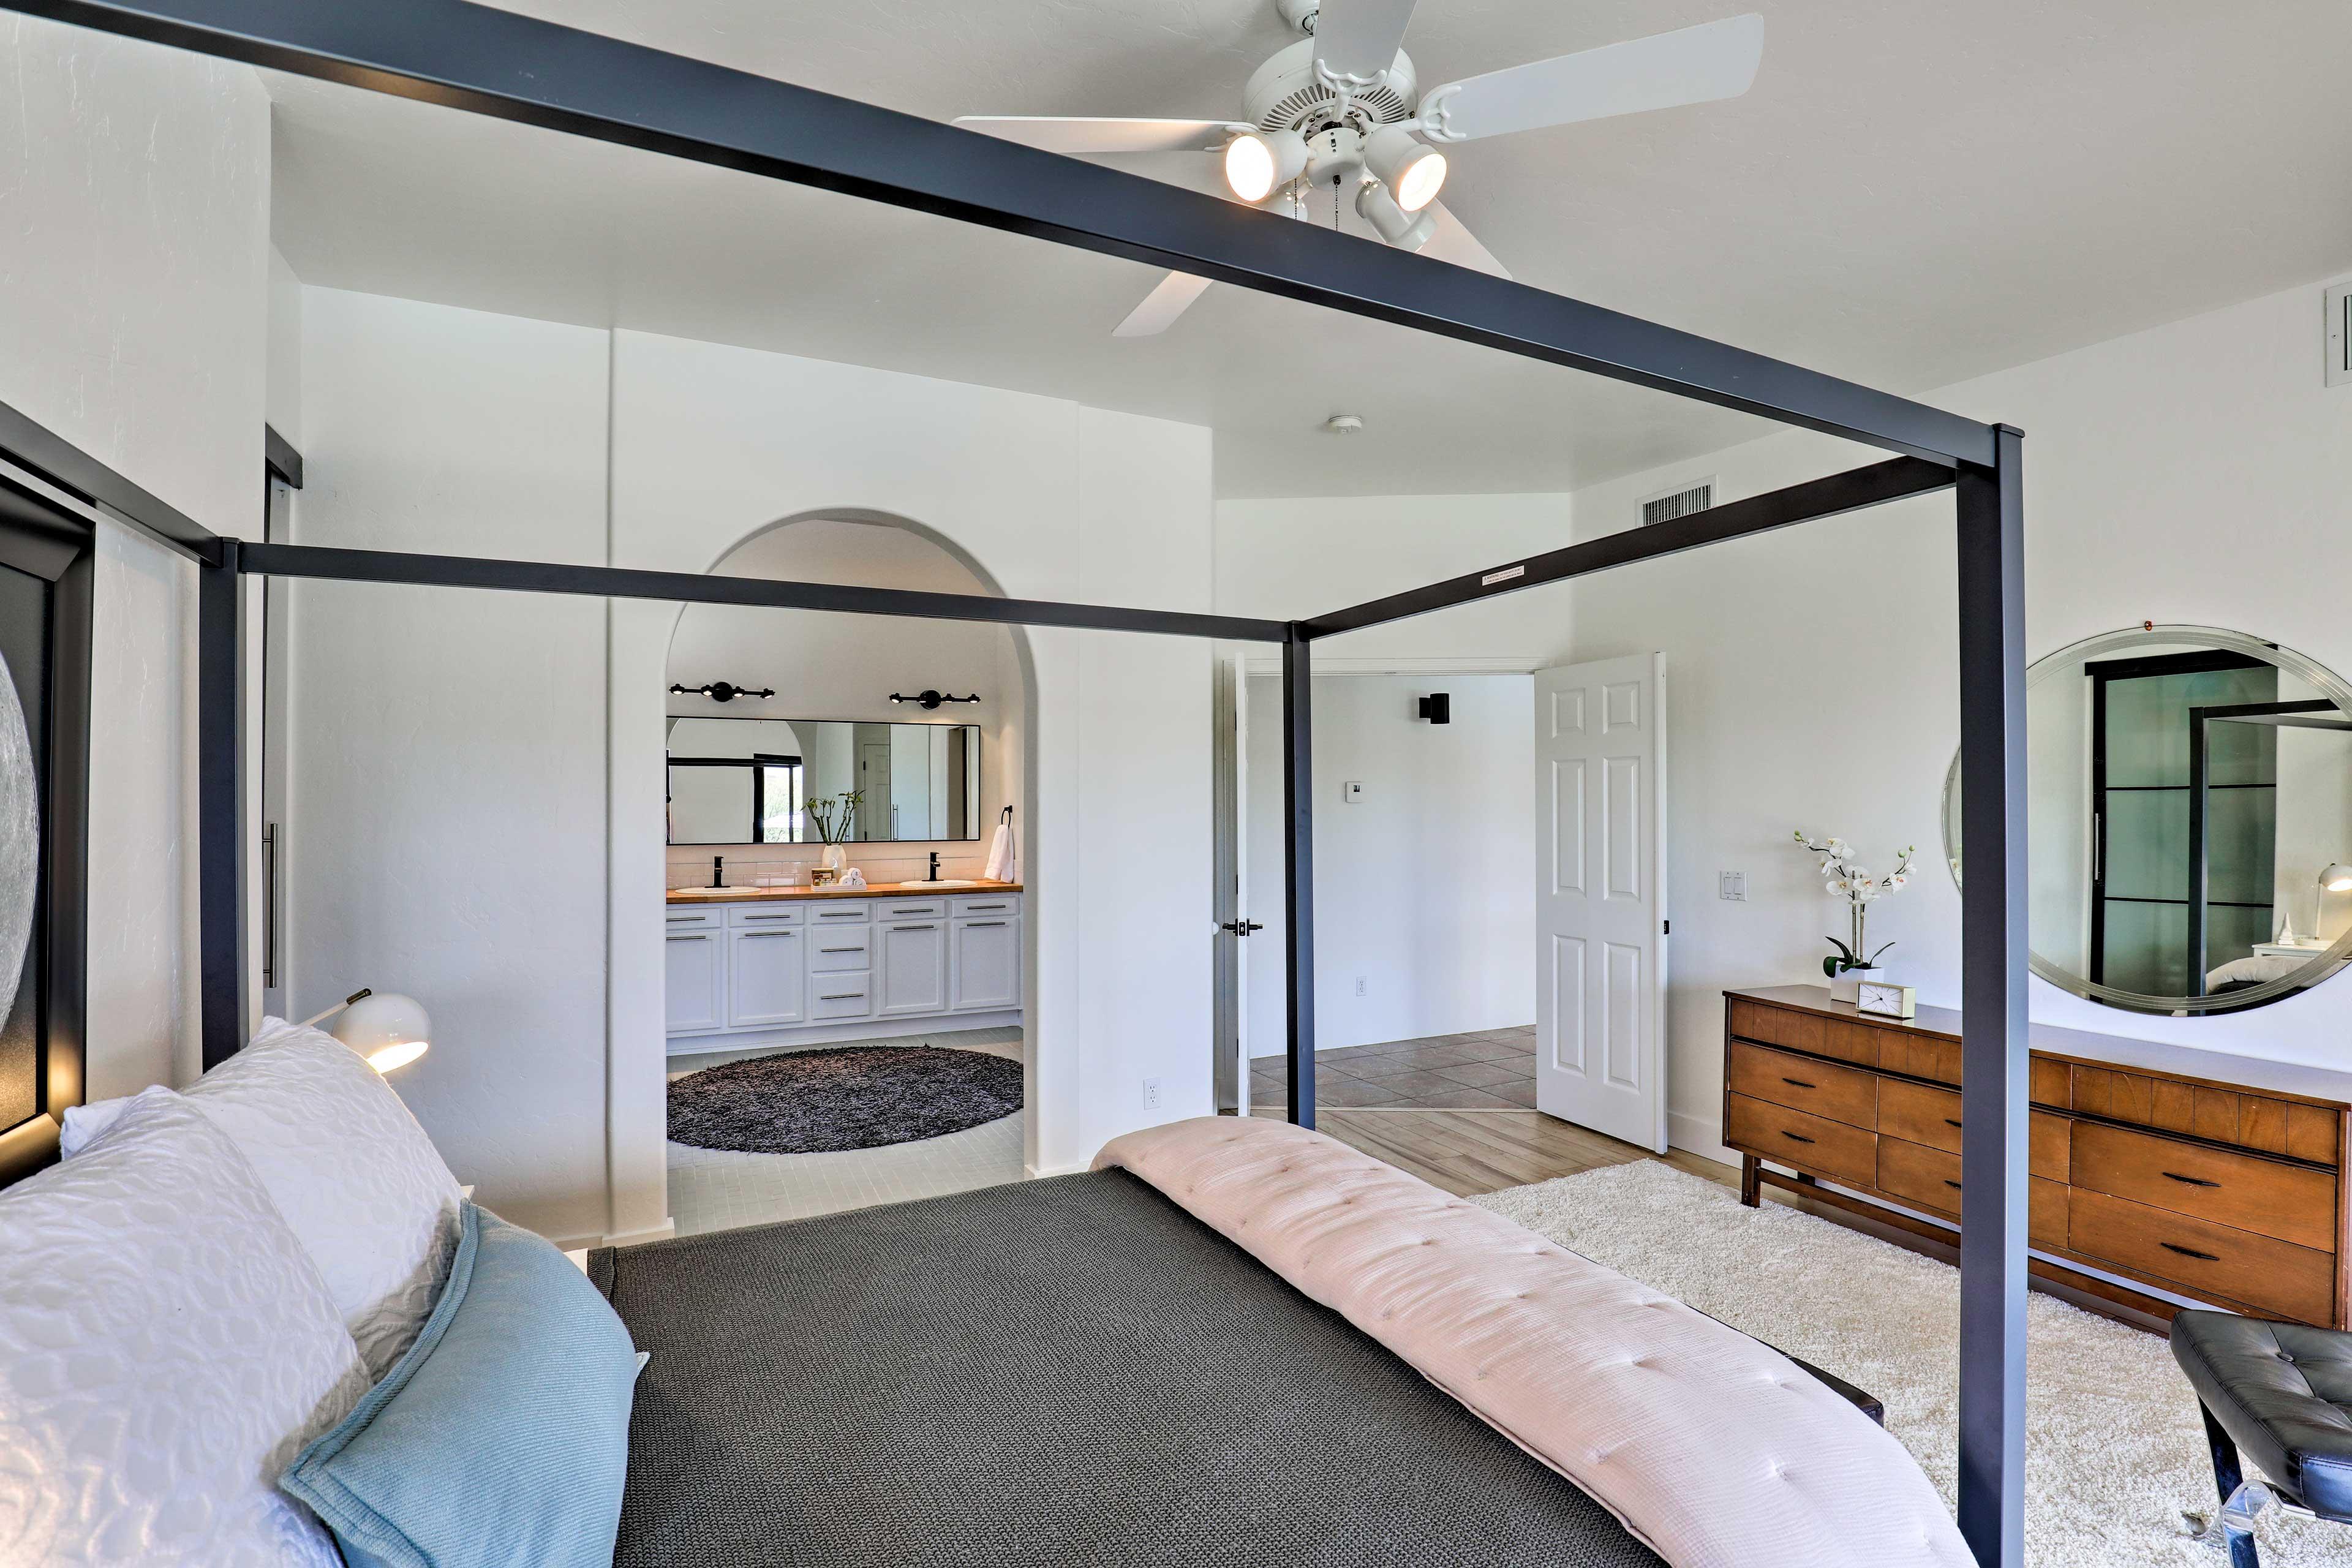 This master bedroom offers an en-suite bathroom.